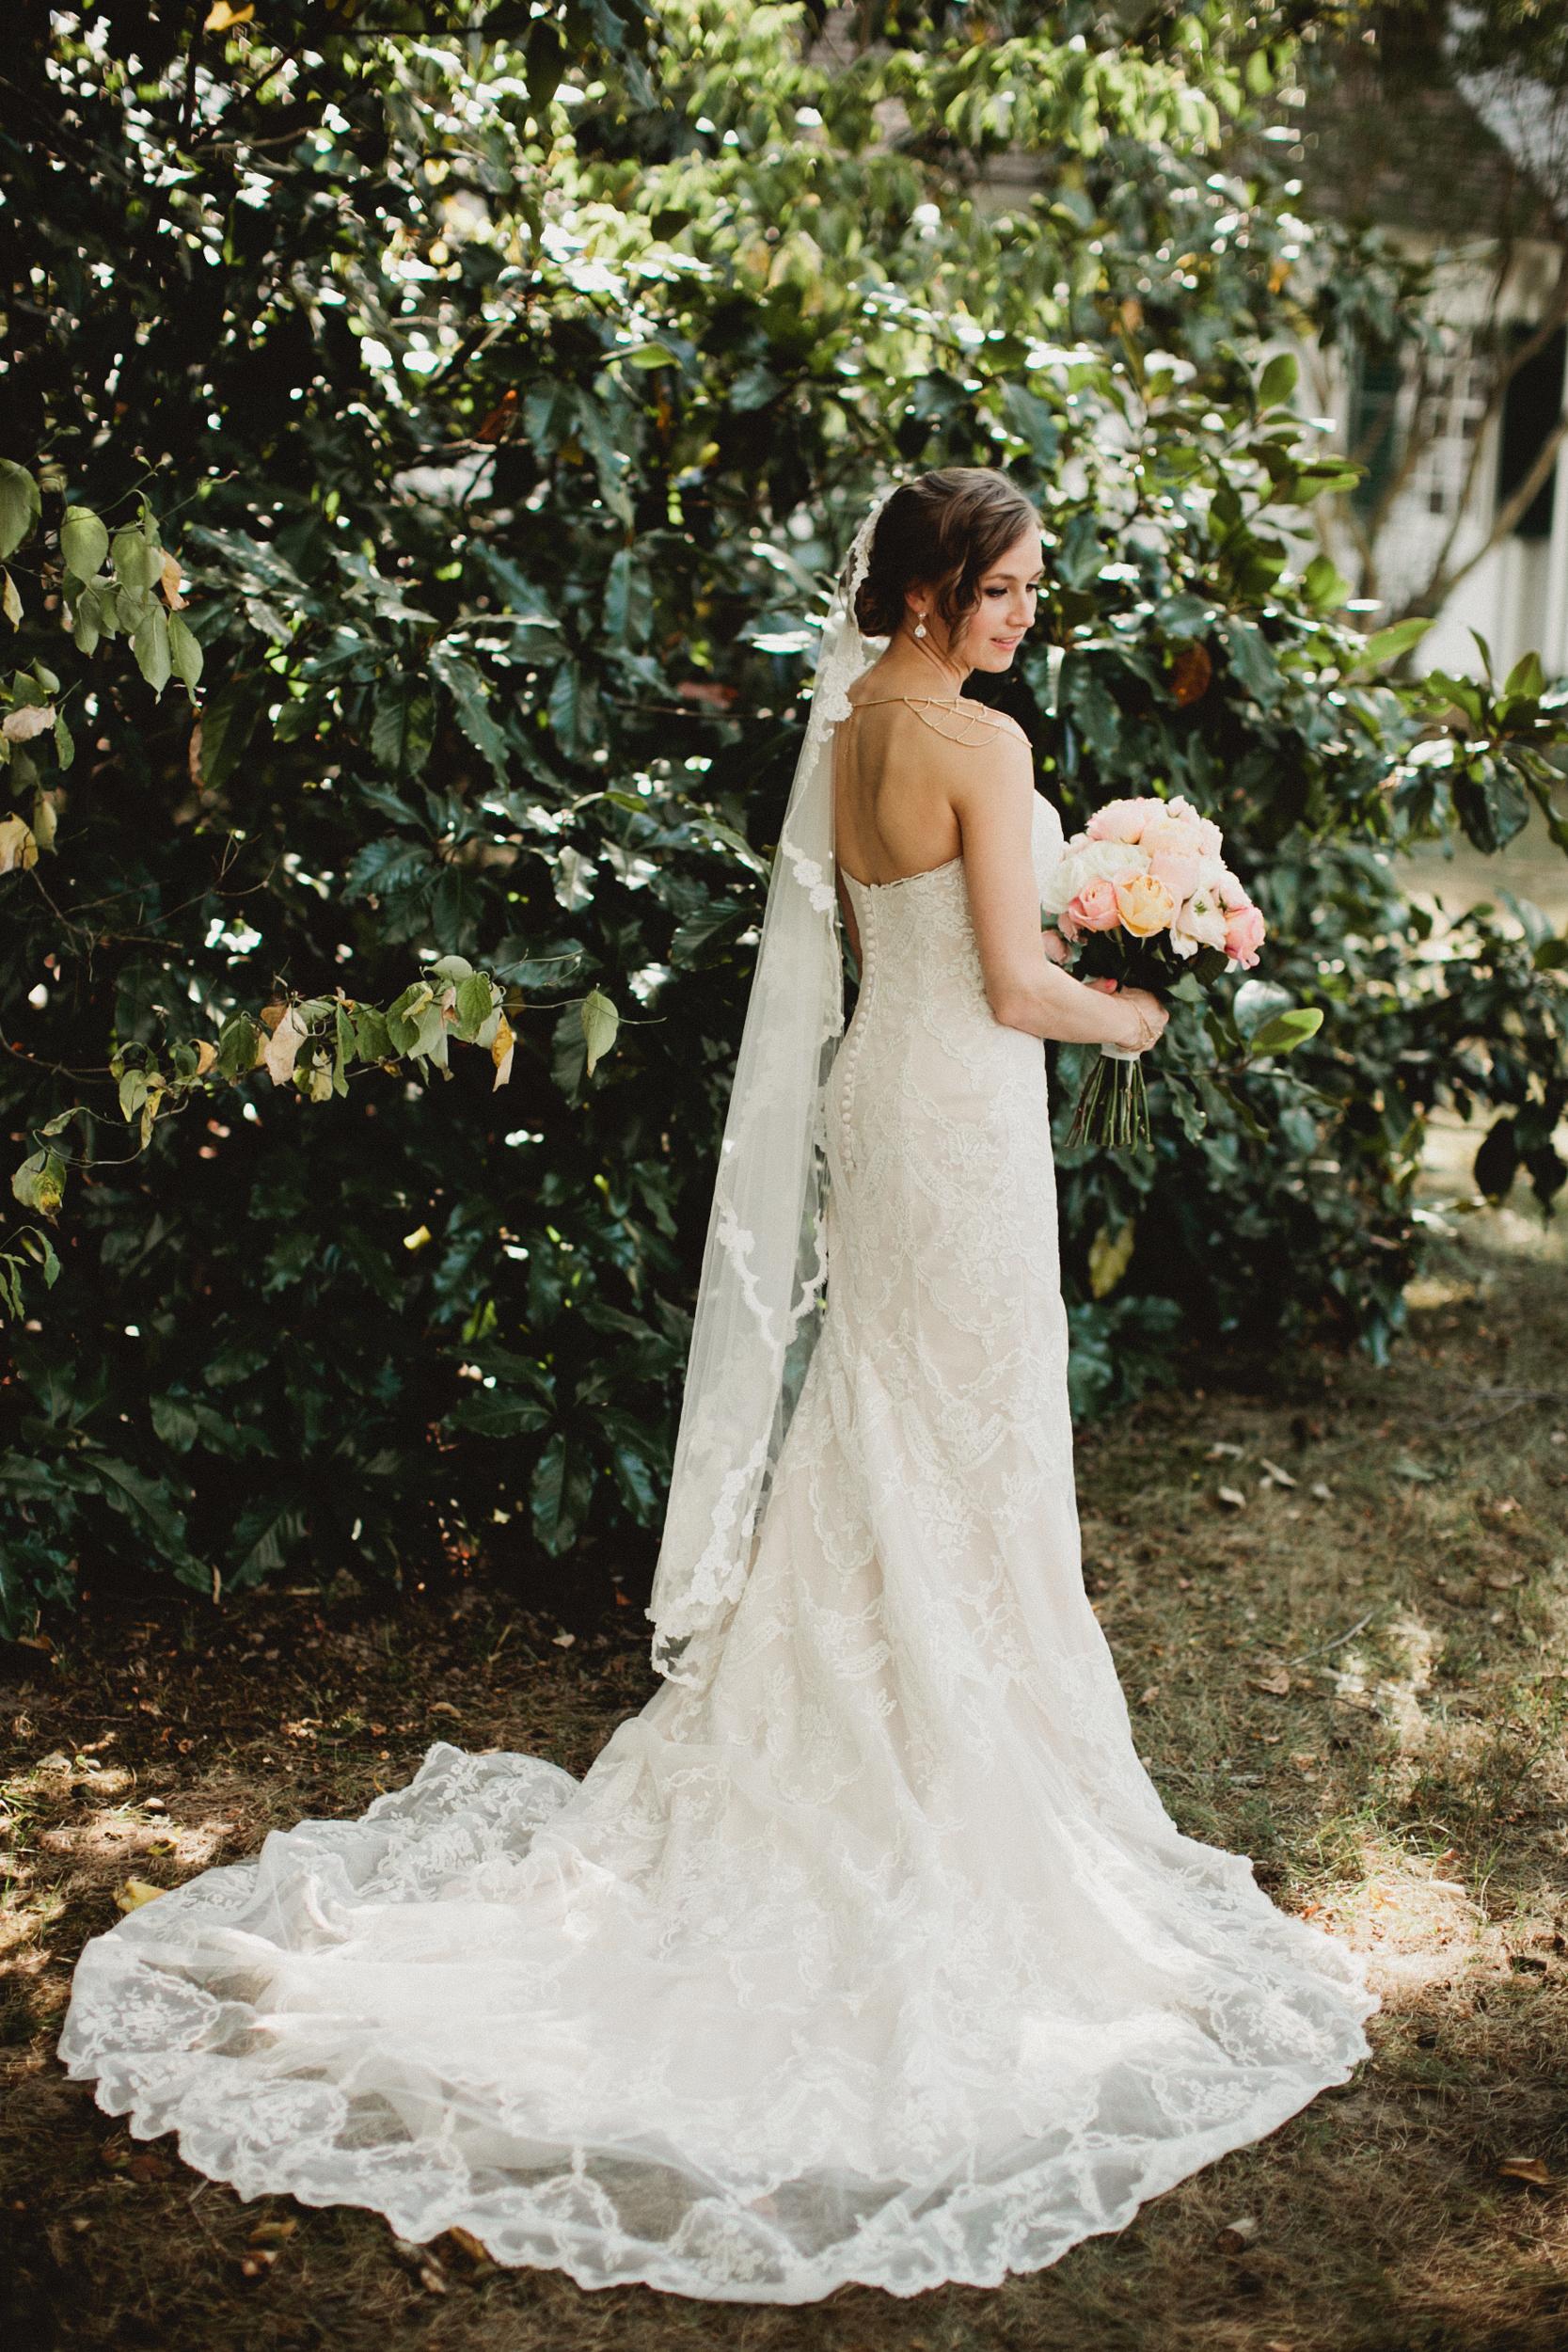 Maine-Wedding-Photographer-1002.jpg